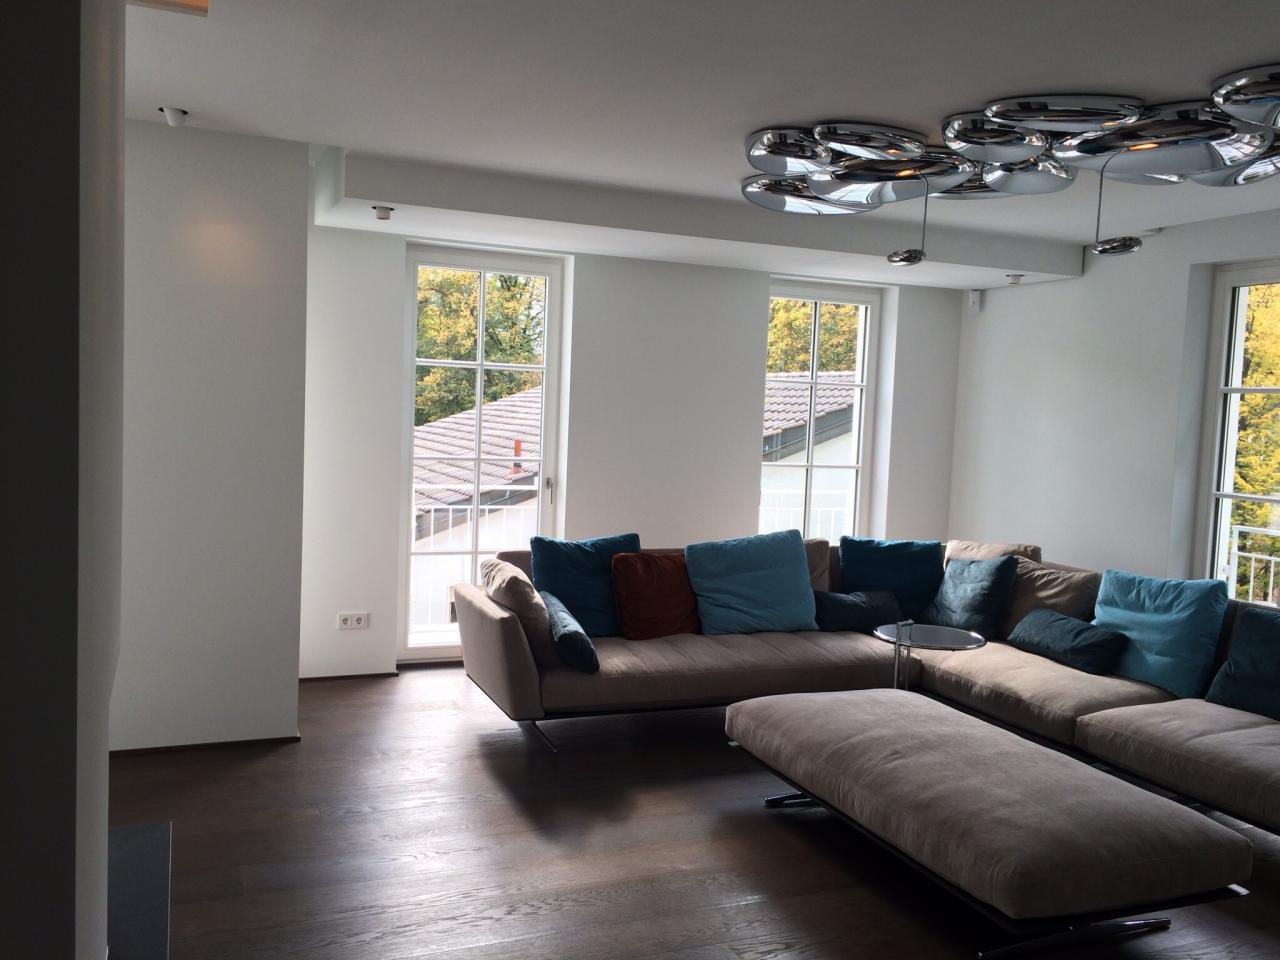 heimkino beratung planung und installation. Black Bedroom Furniture Sets. Home Design Ideas